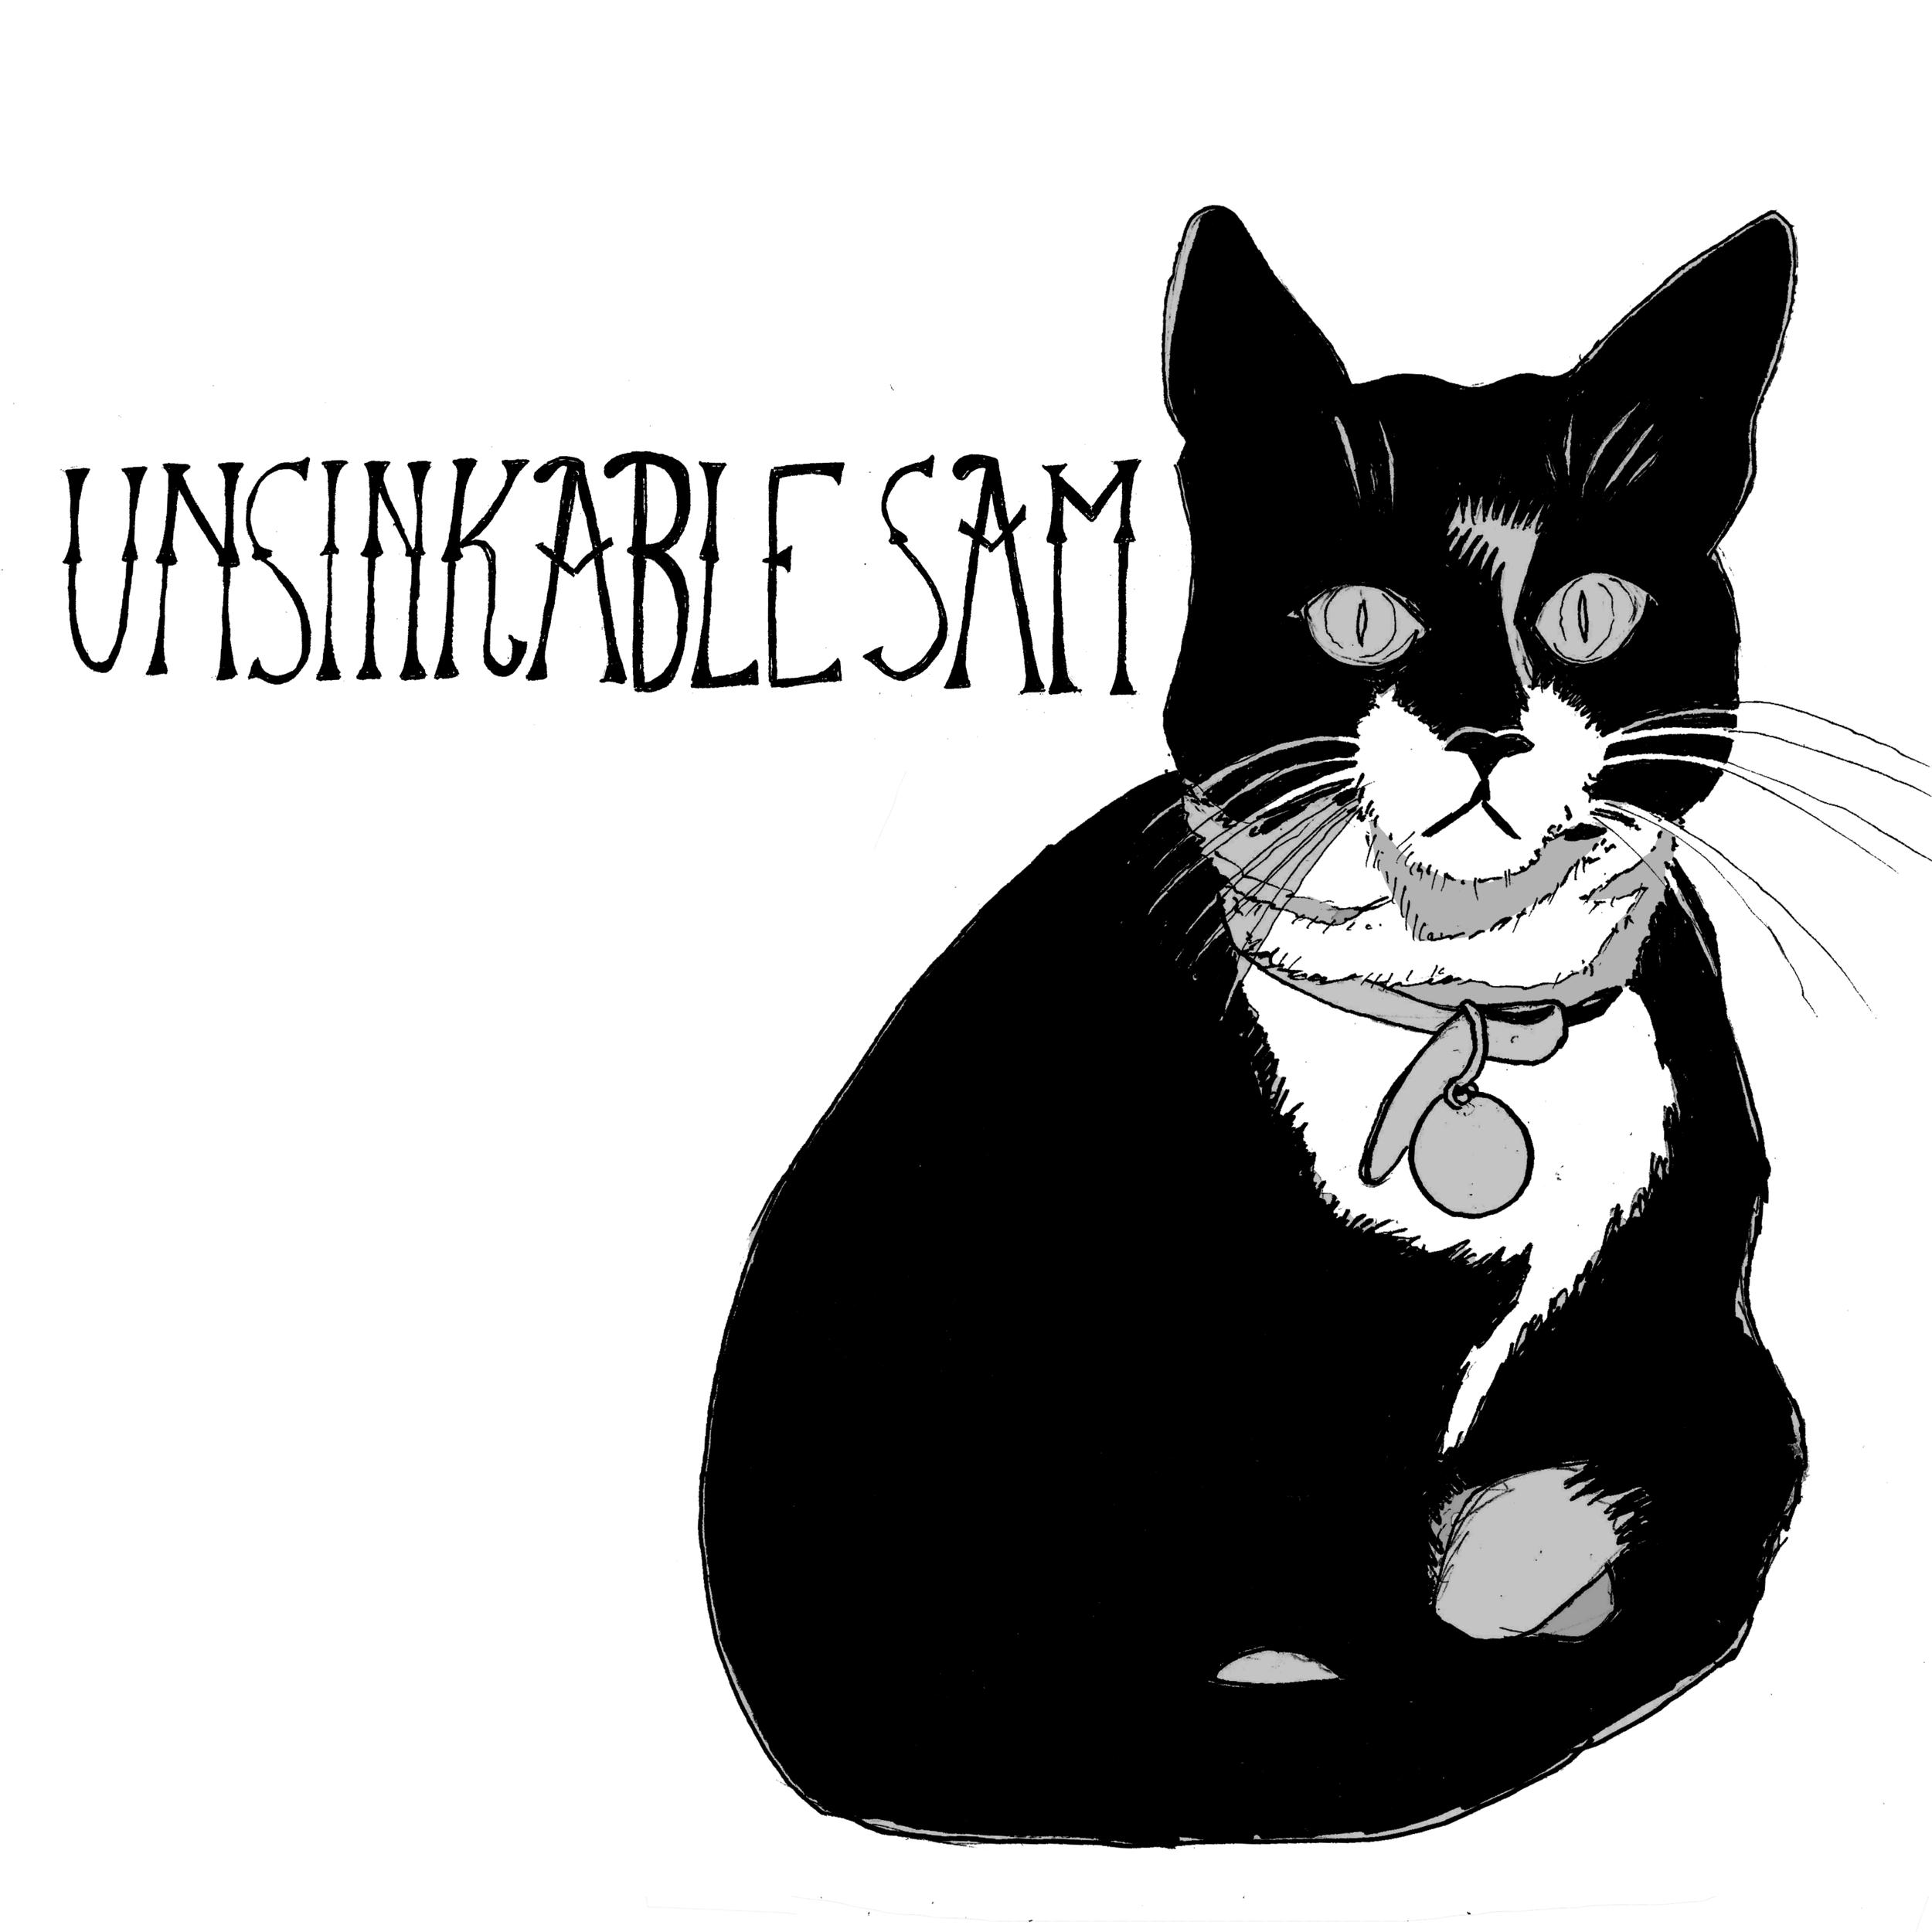 Unsinkable Sam